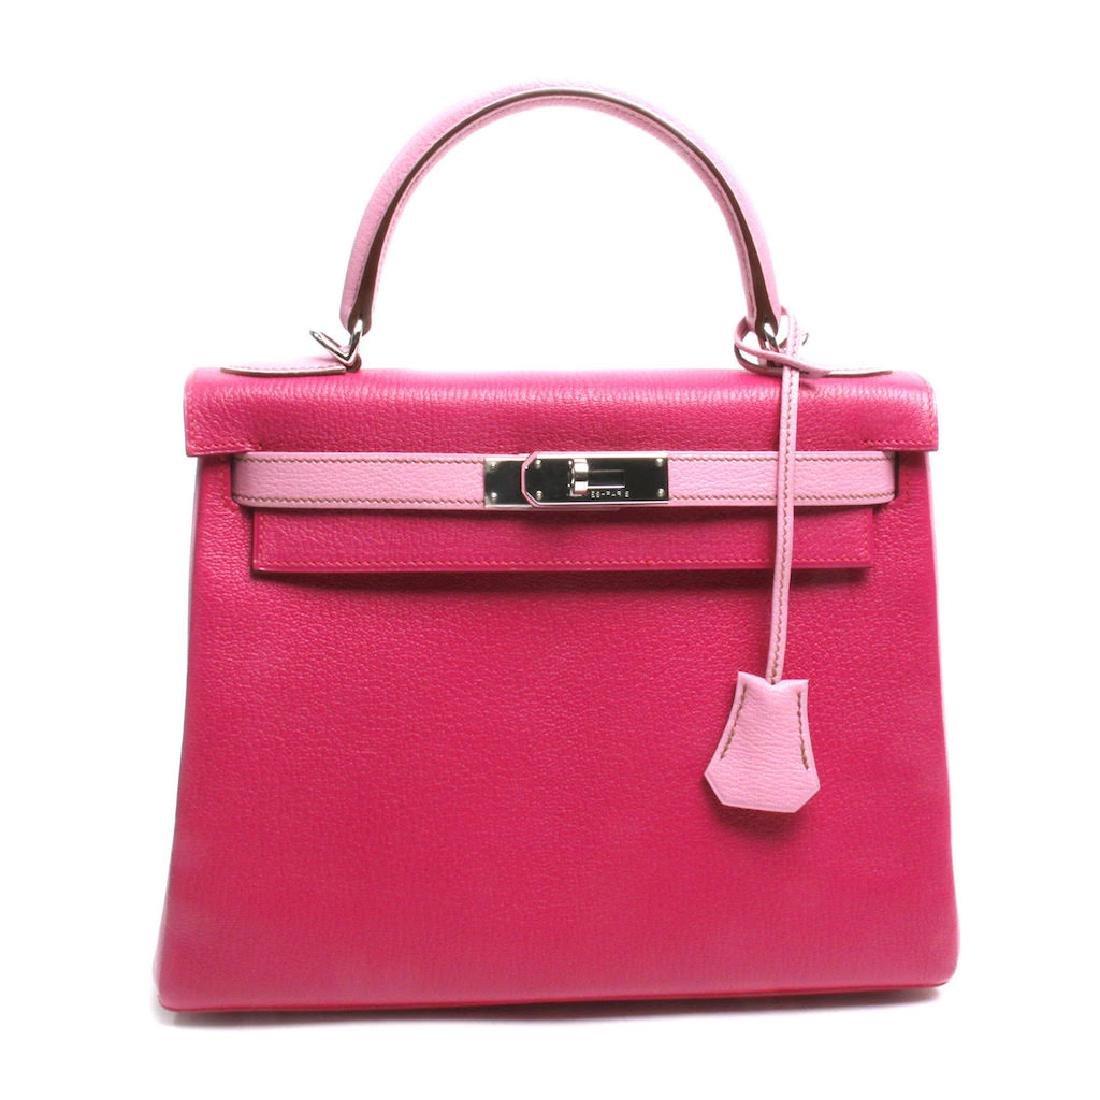 Hermes Horseshoe Fuchsia & Pink Chevre Kelly Bag